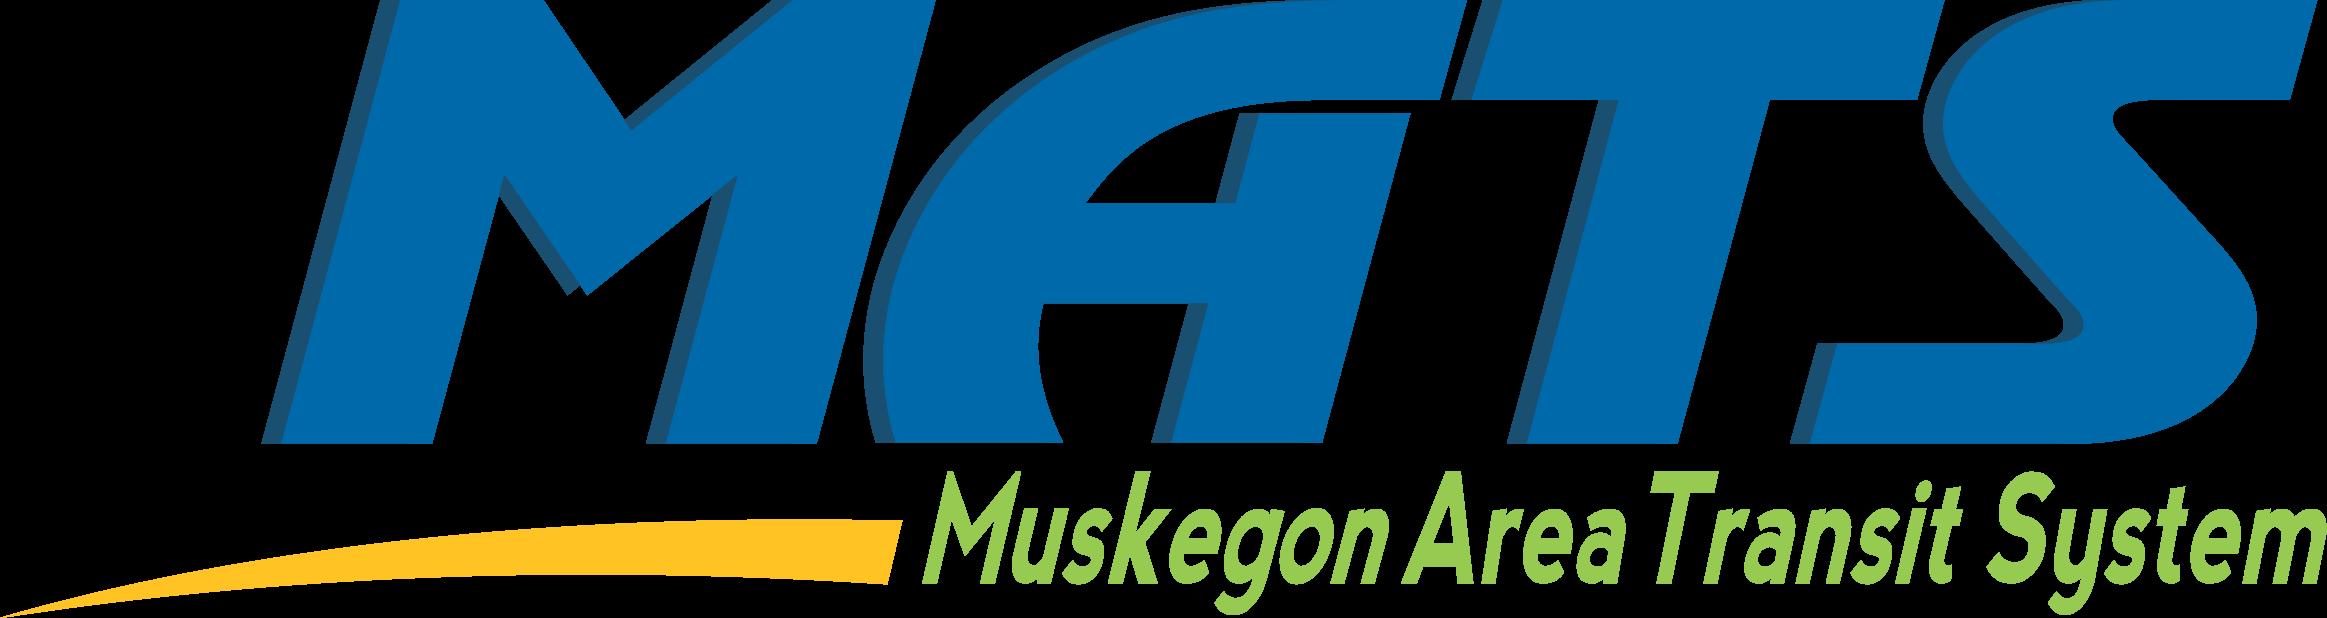 Muskegon Area Transit System